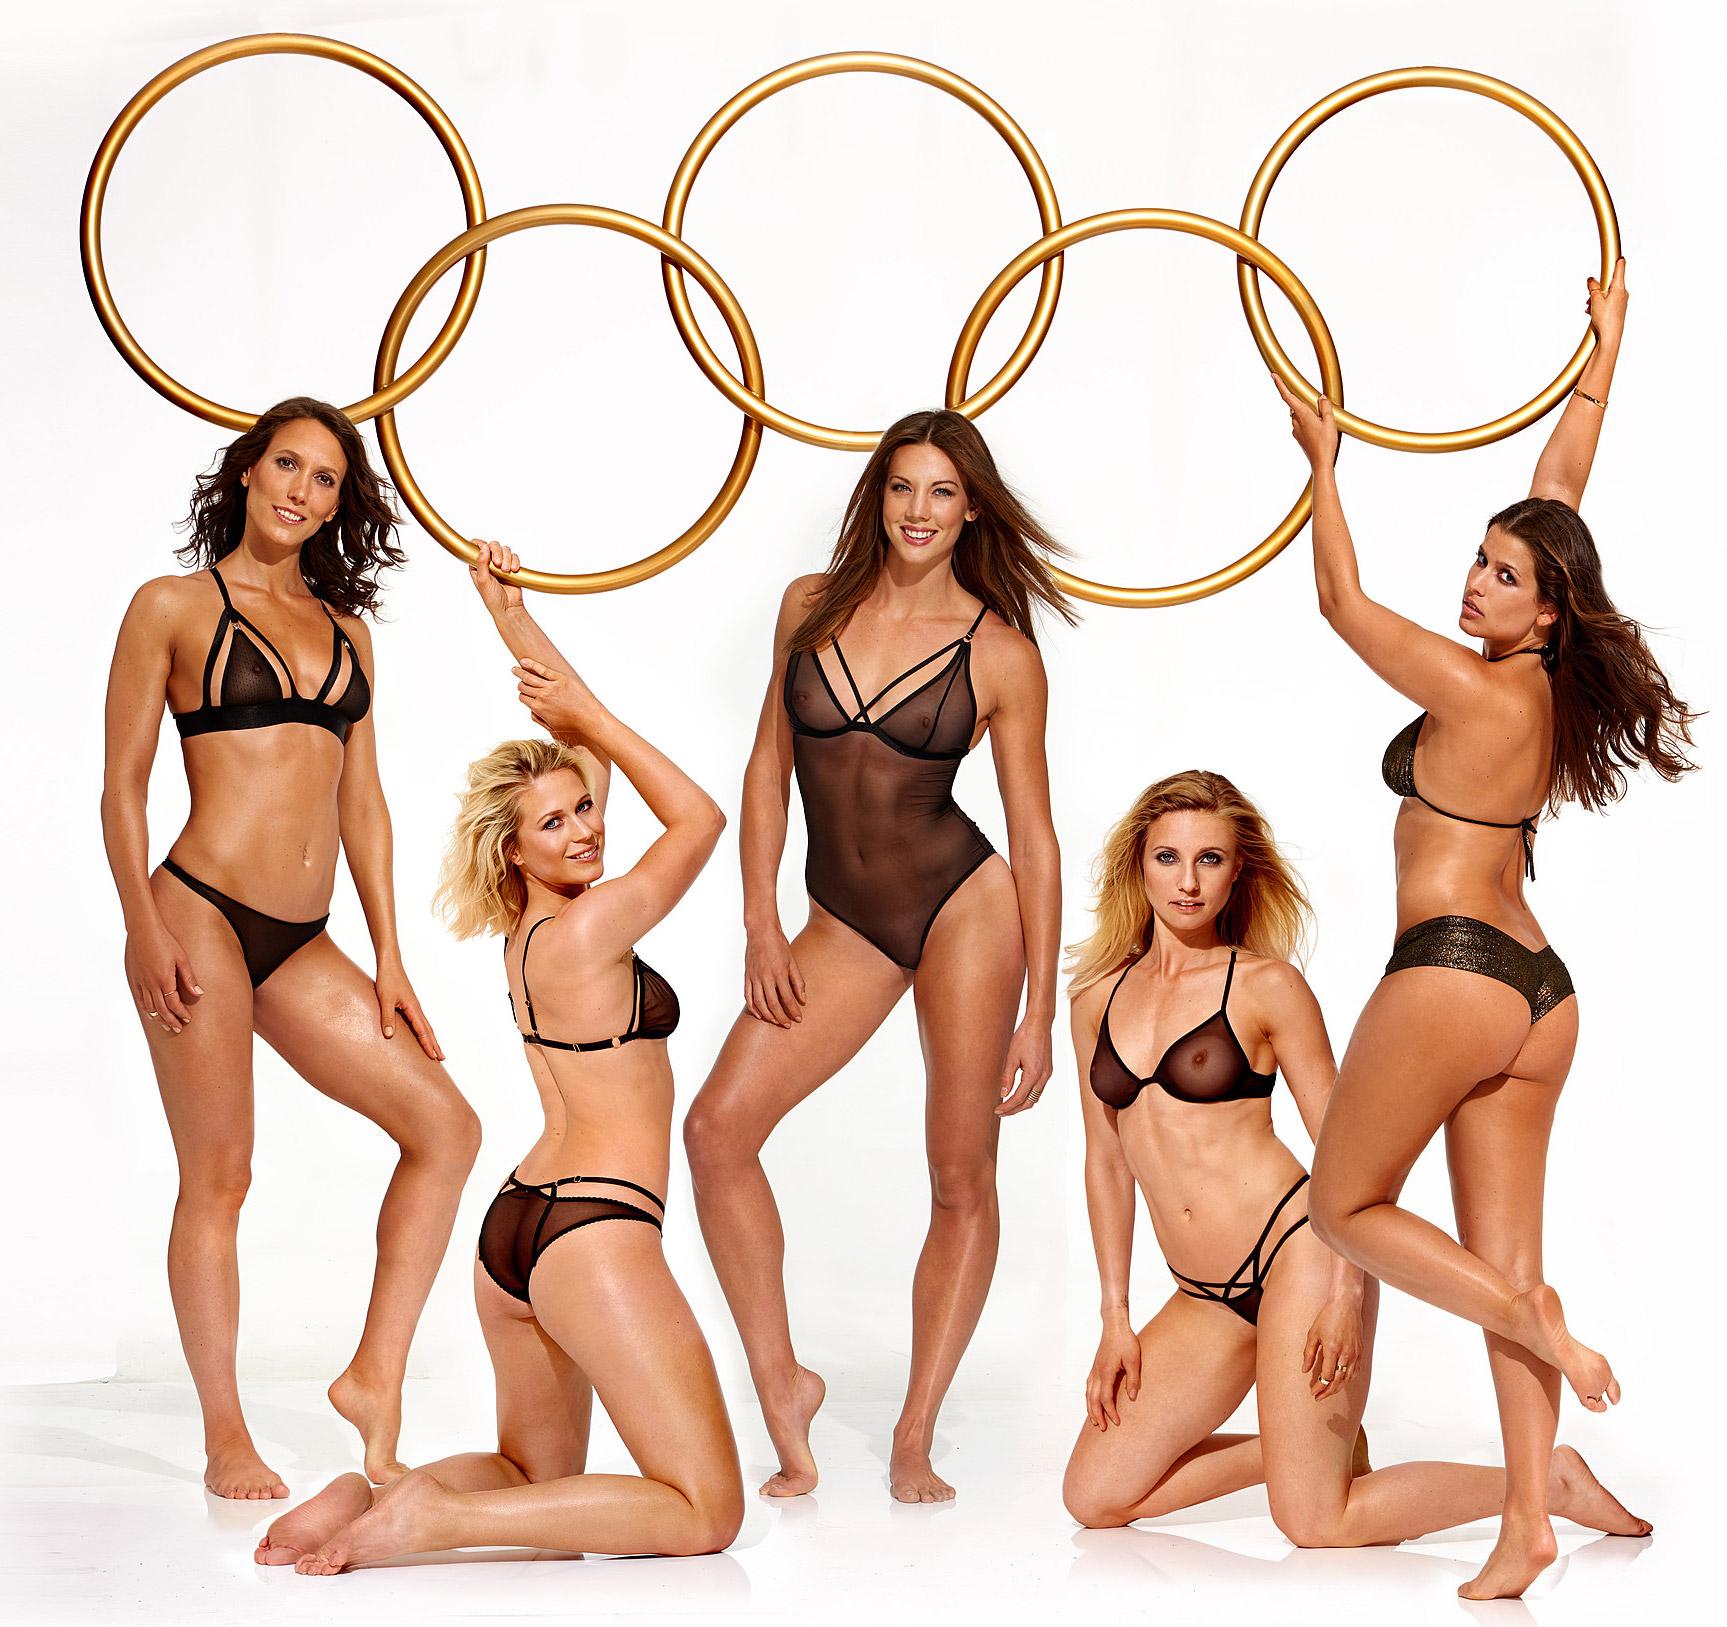 German-Nude-Olympic-Stars-for-Playboy-1.jpg